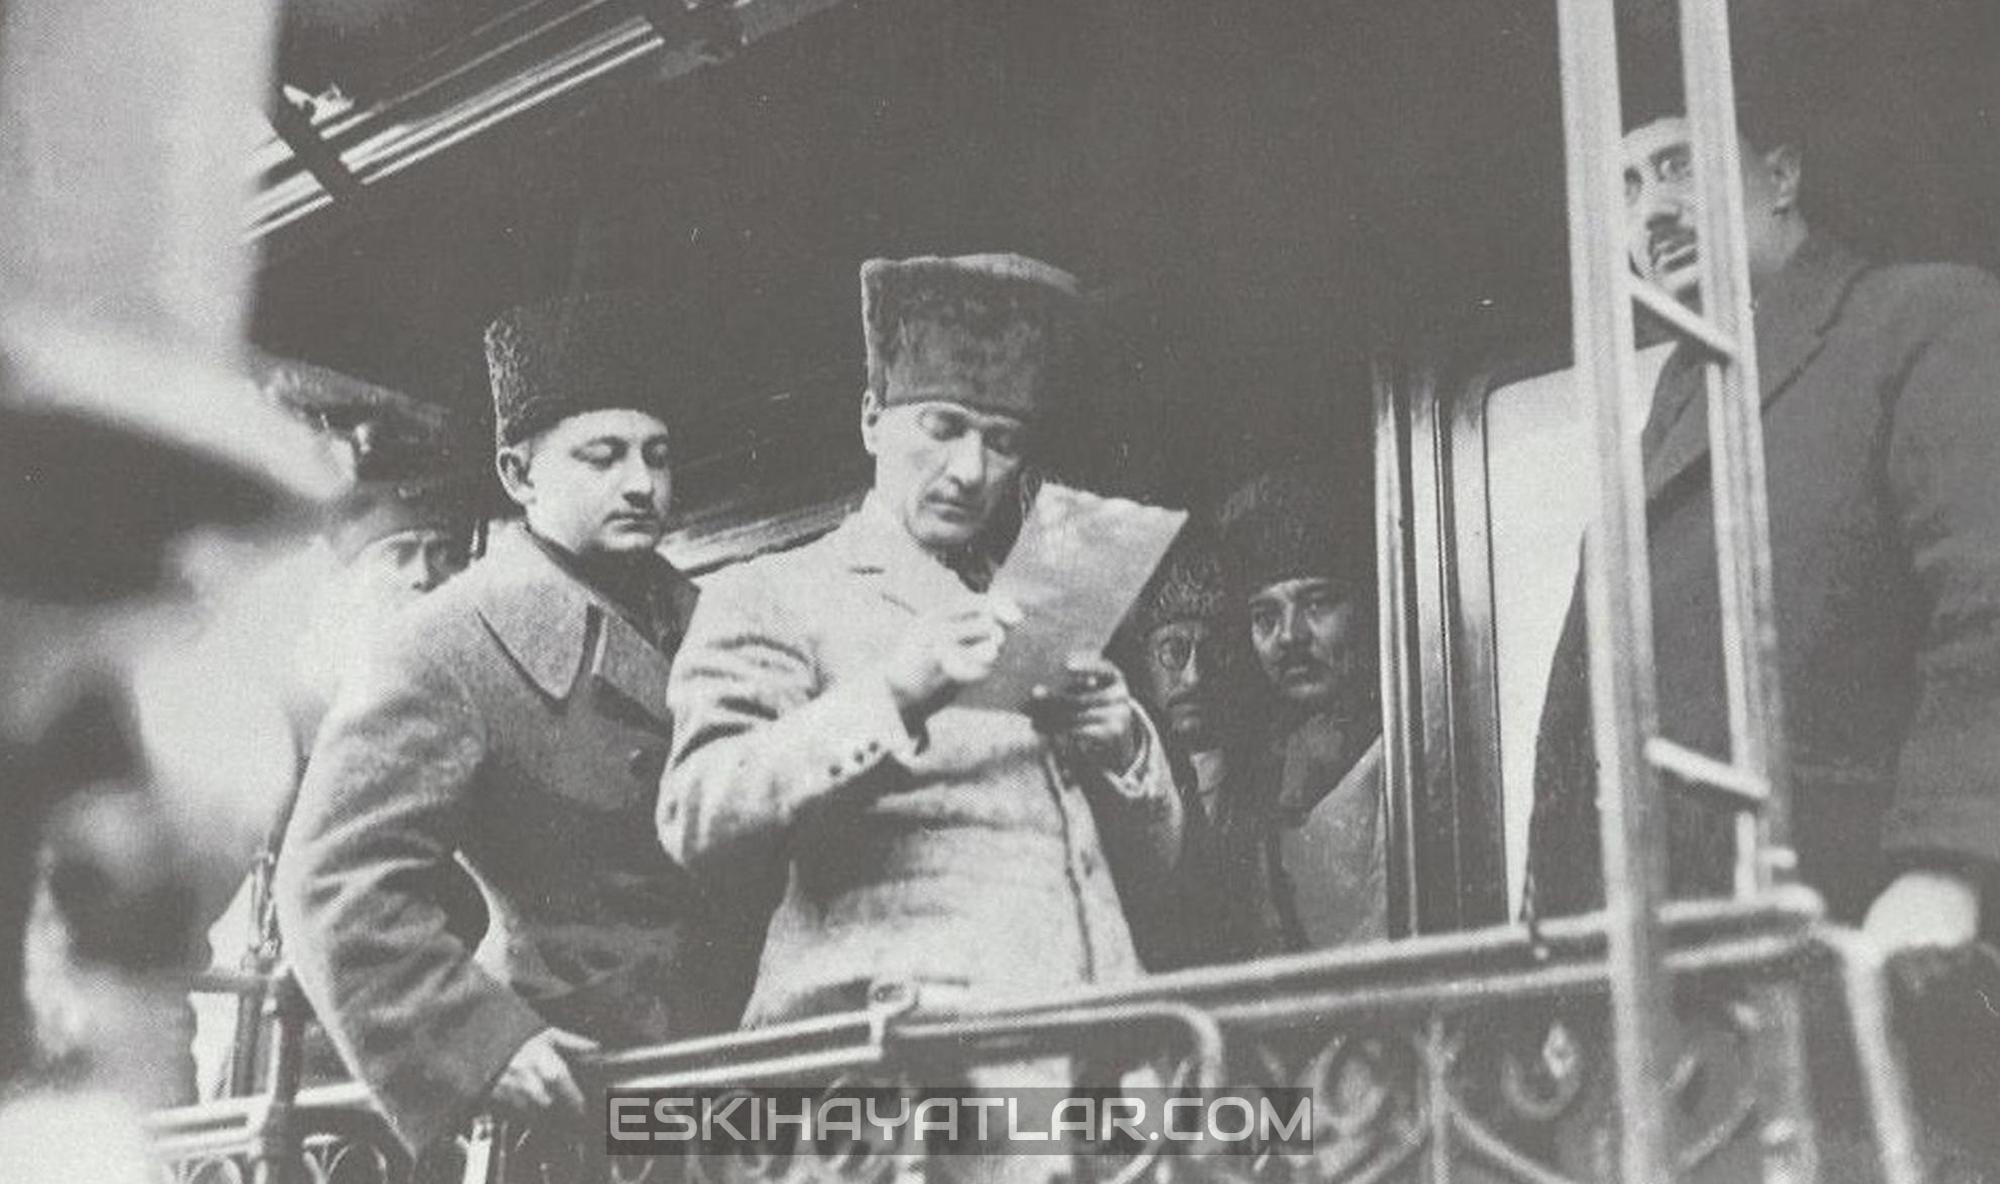 ataturk-izmir-gunleri-mustafa-kemal-pasa-1922-izmir-fotograflari (5)